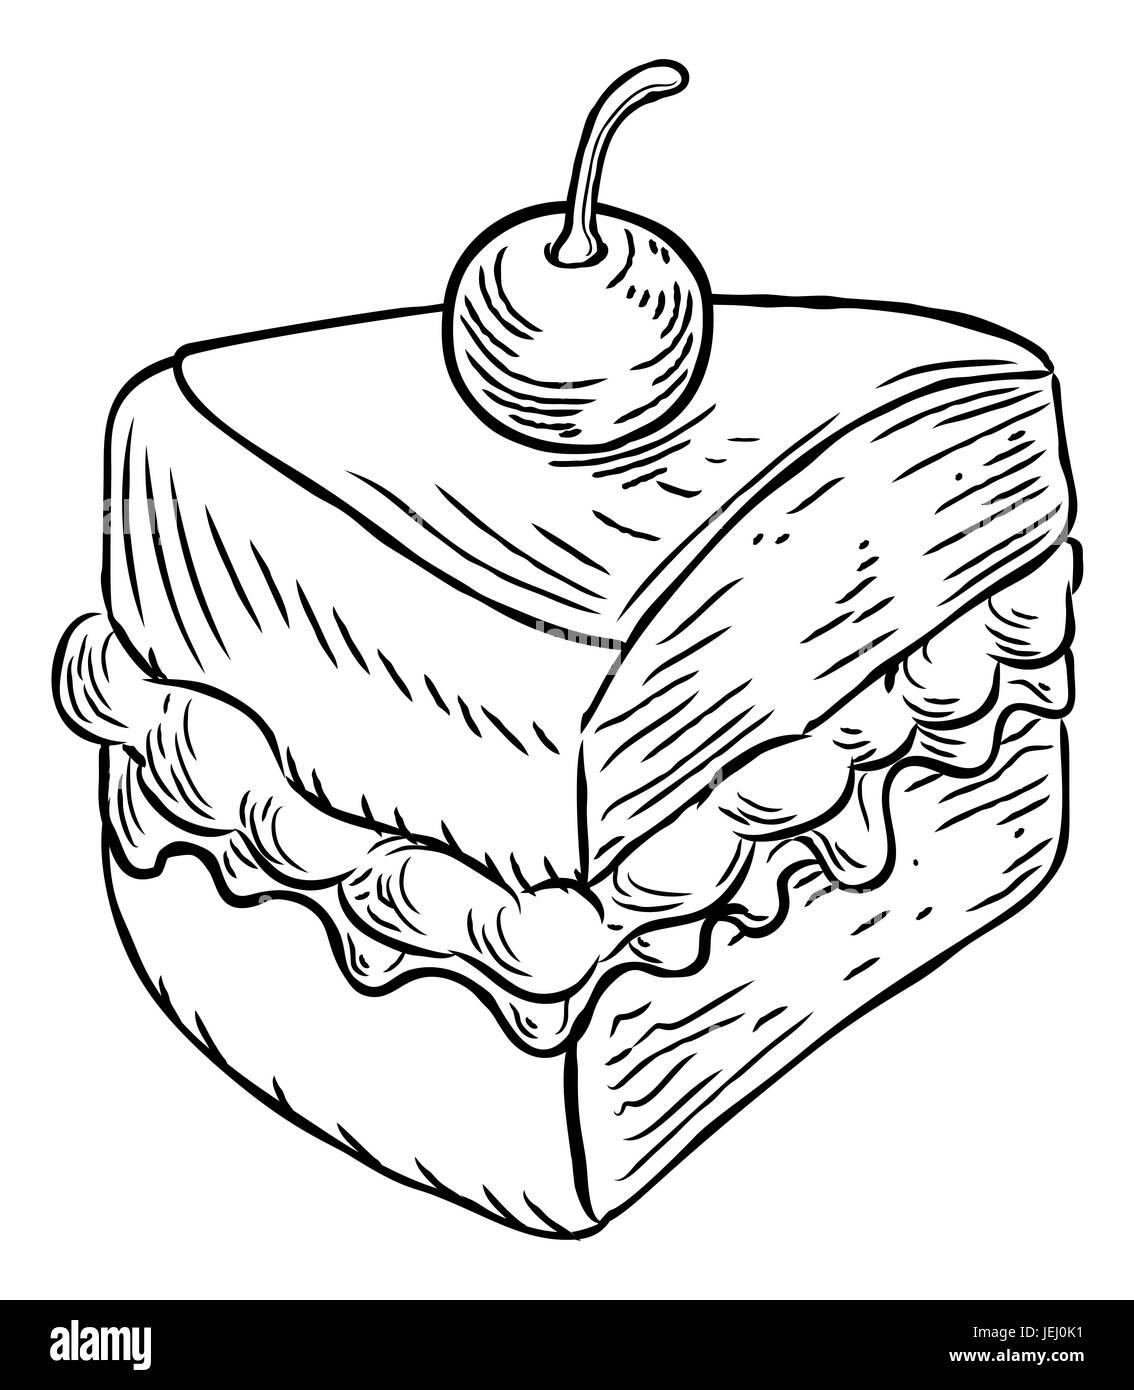 Shopkins Sponge Cake